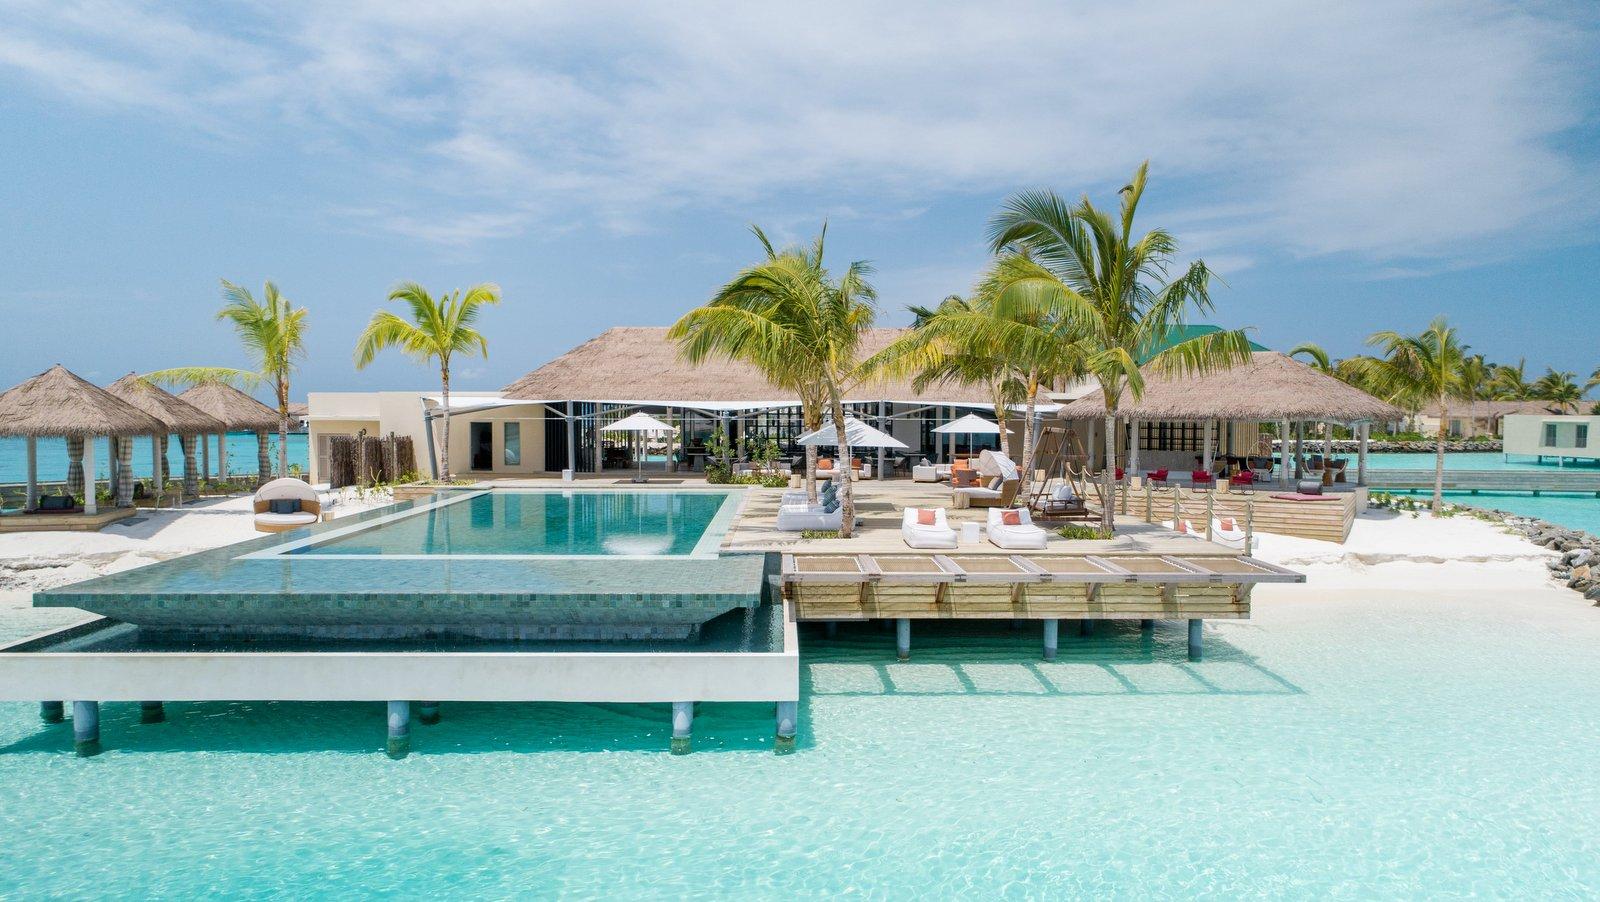 Мальдивы, отель Intercontinental Maldives Maamunagau, бассейн